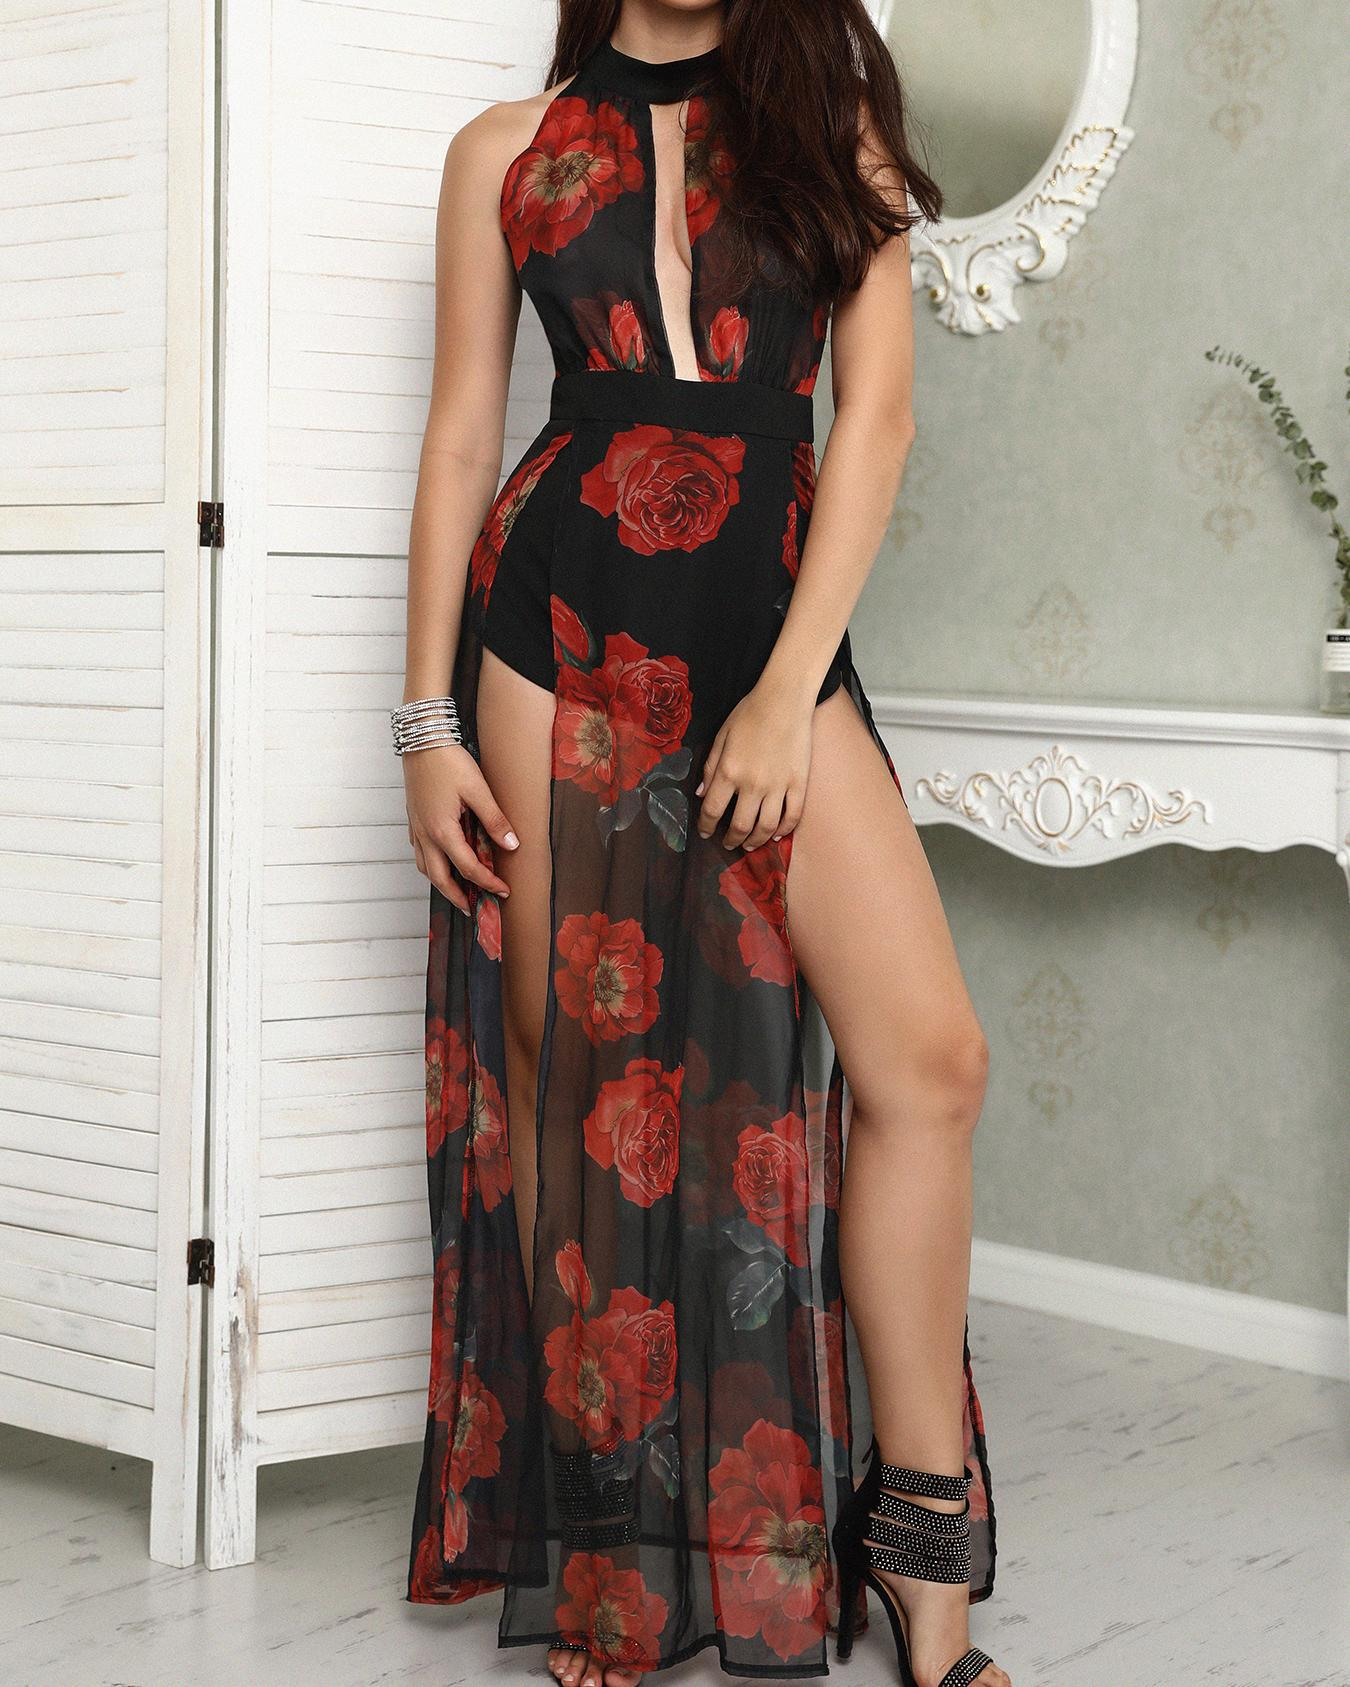 Floral Print Halter Cutout High Slit Romper Dress, Black